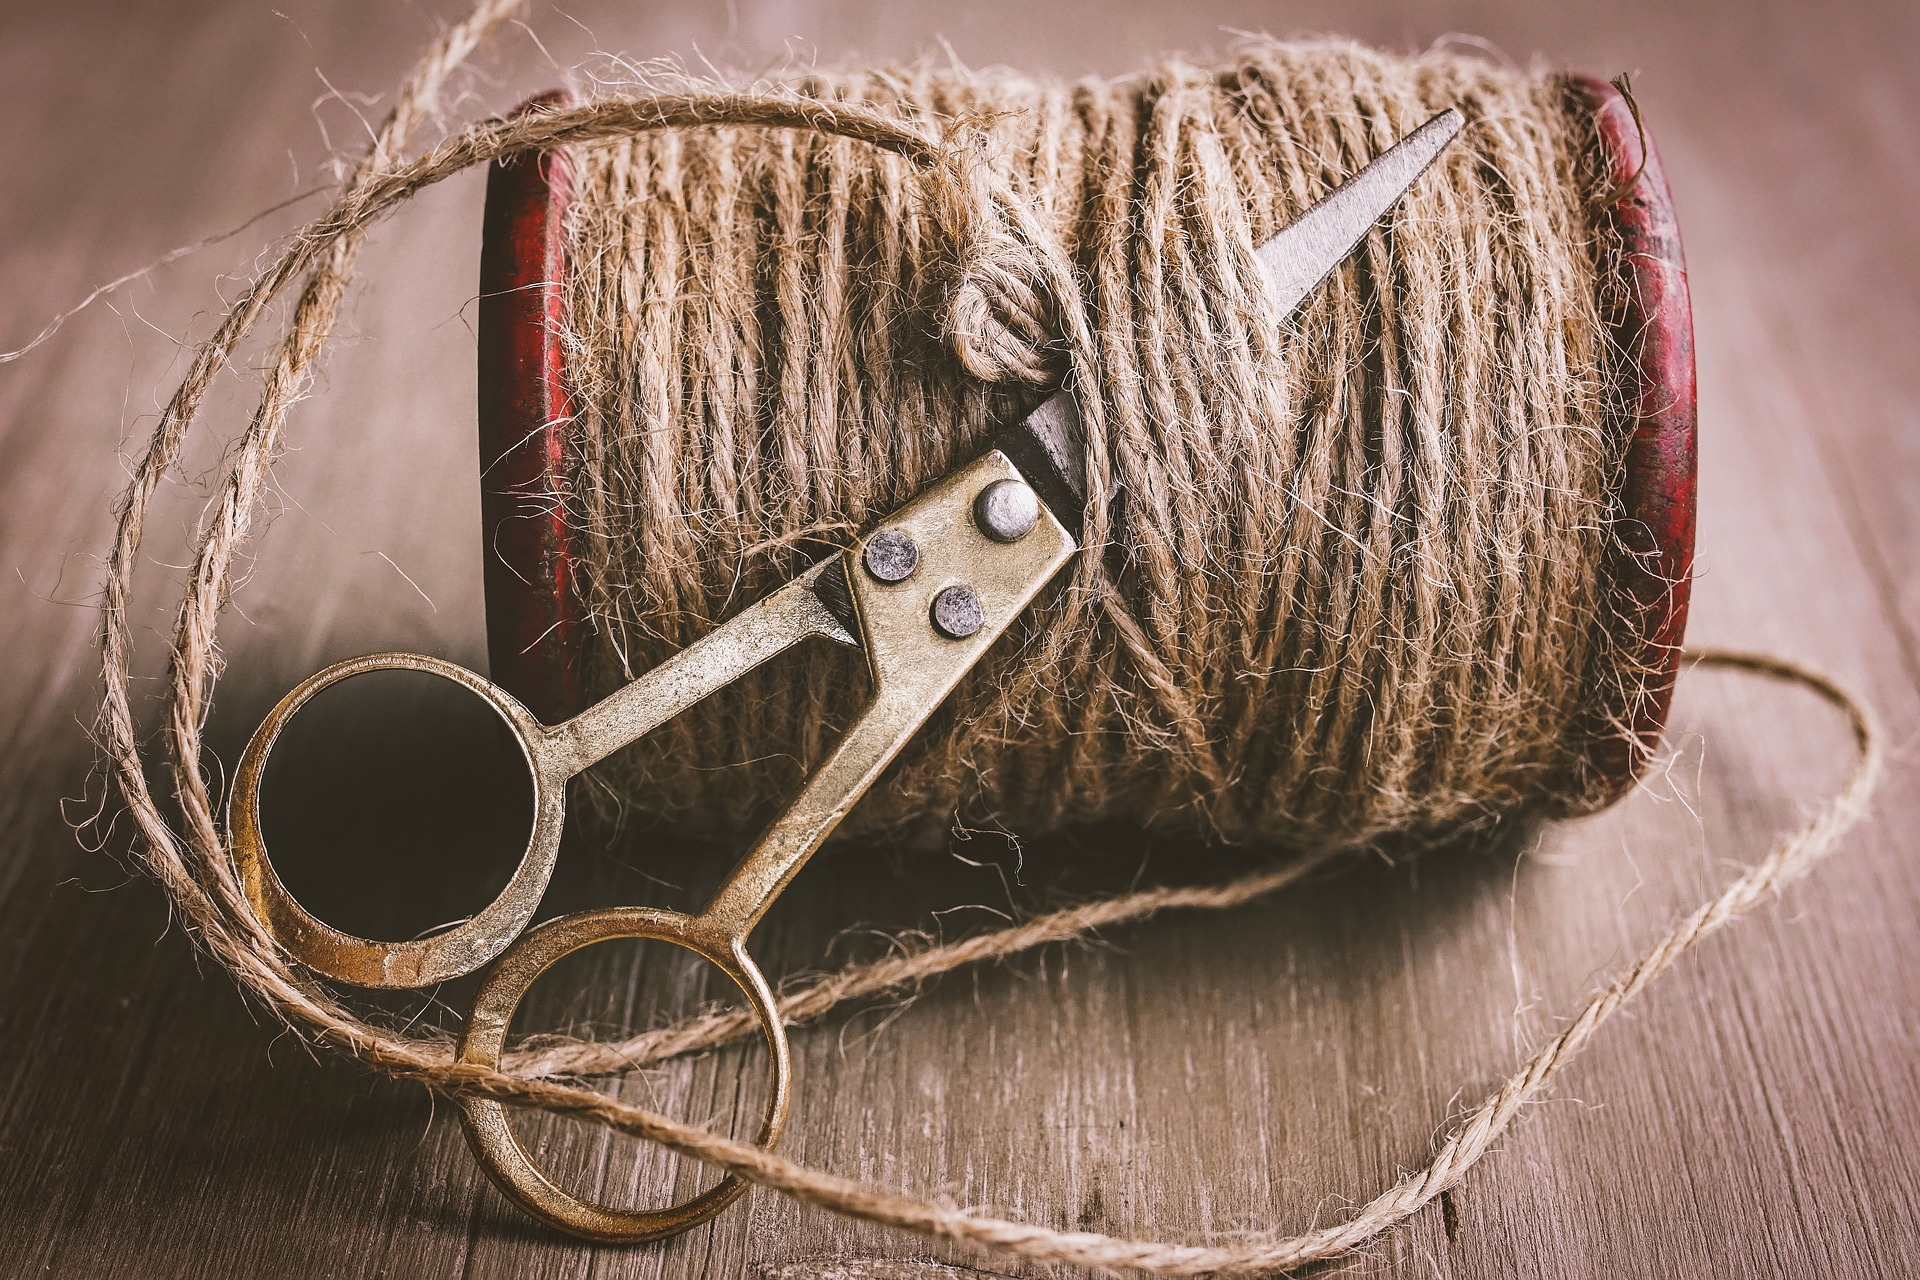 cord-4088055_1920